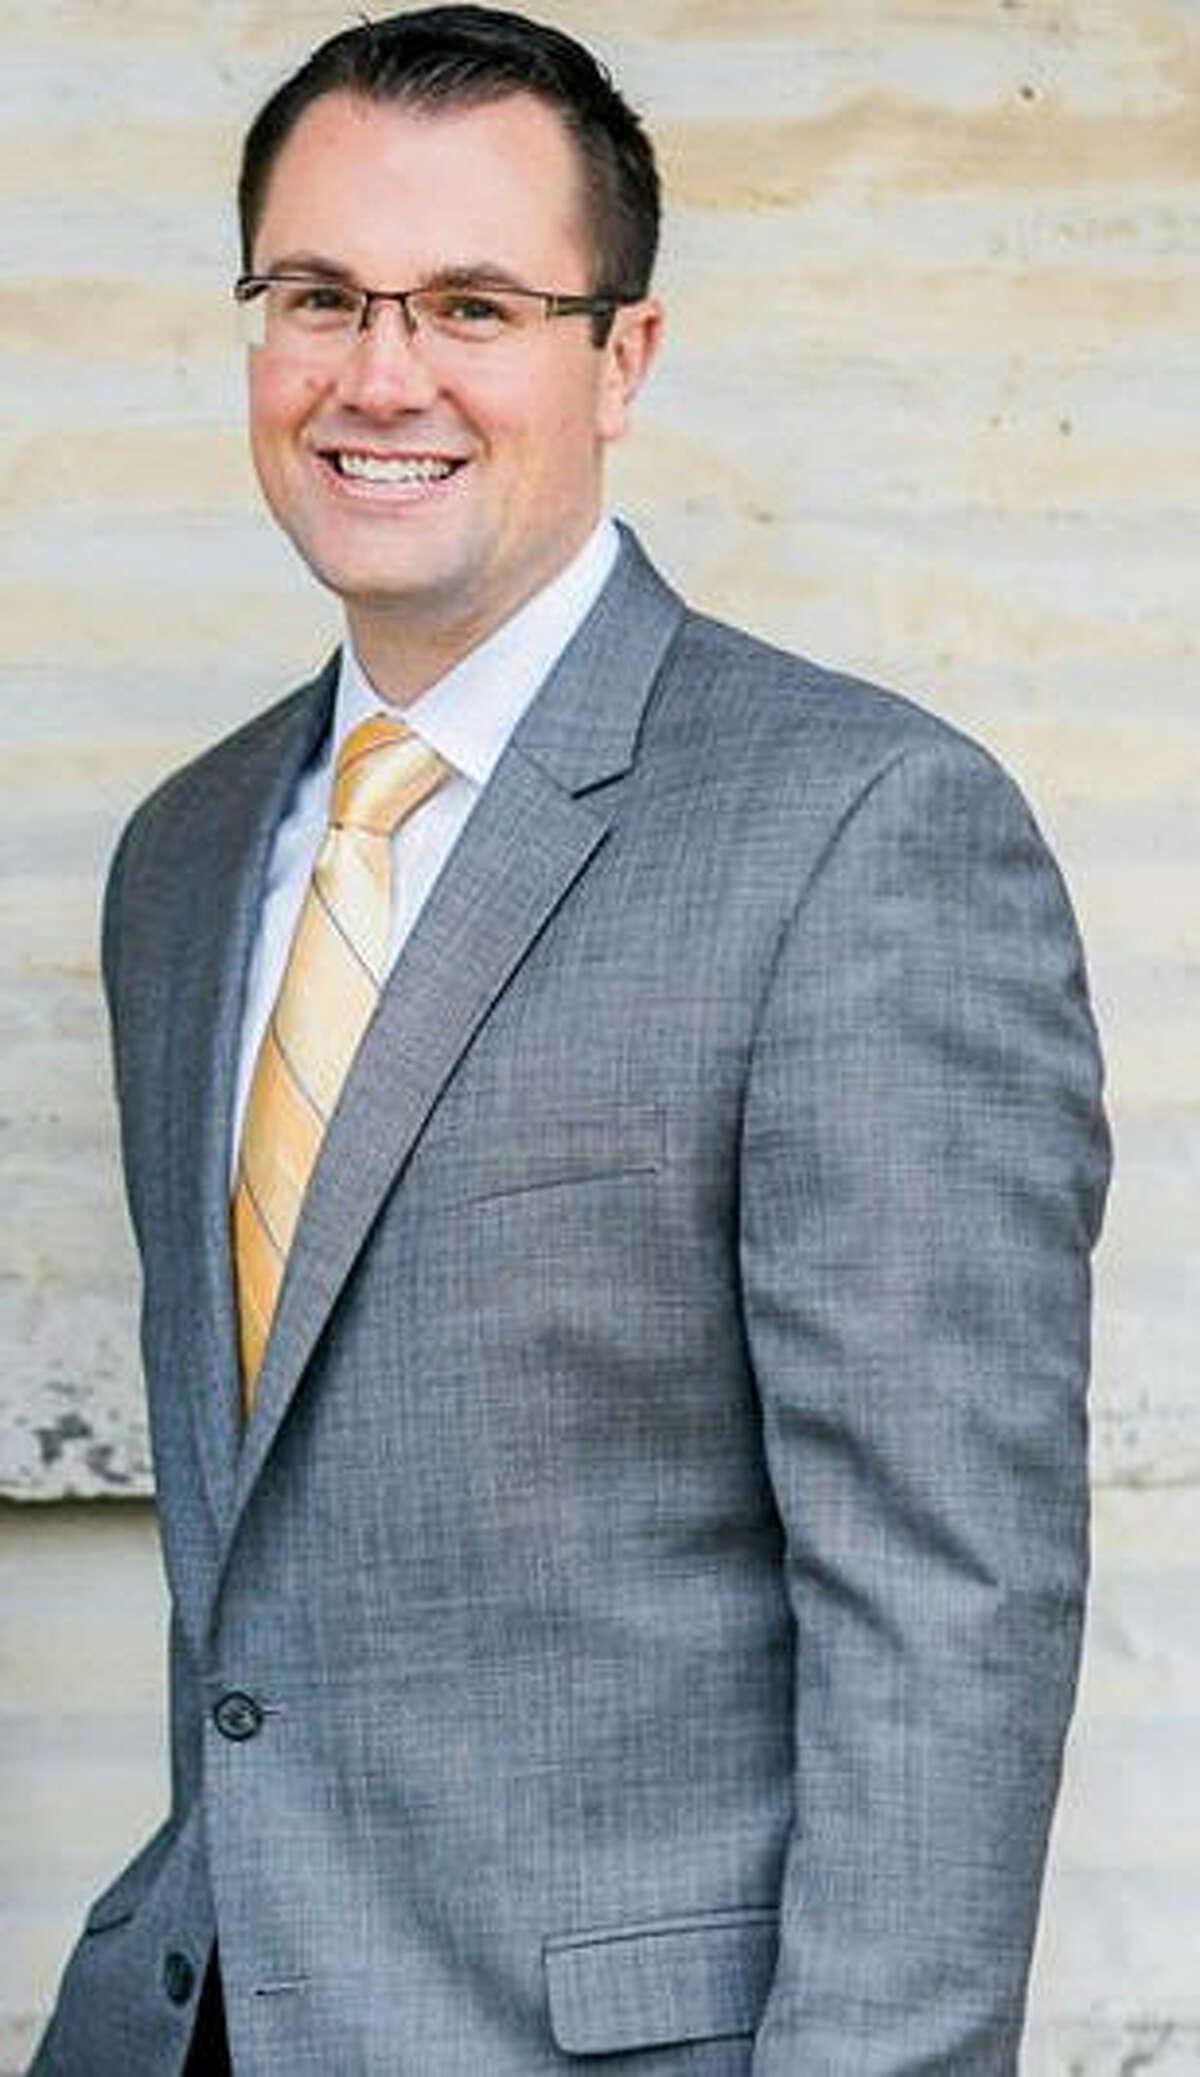 Matthew Berg, CEO of Simfero Consultants, has been appointed toBayou Land Conservancy board of directors.